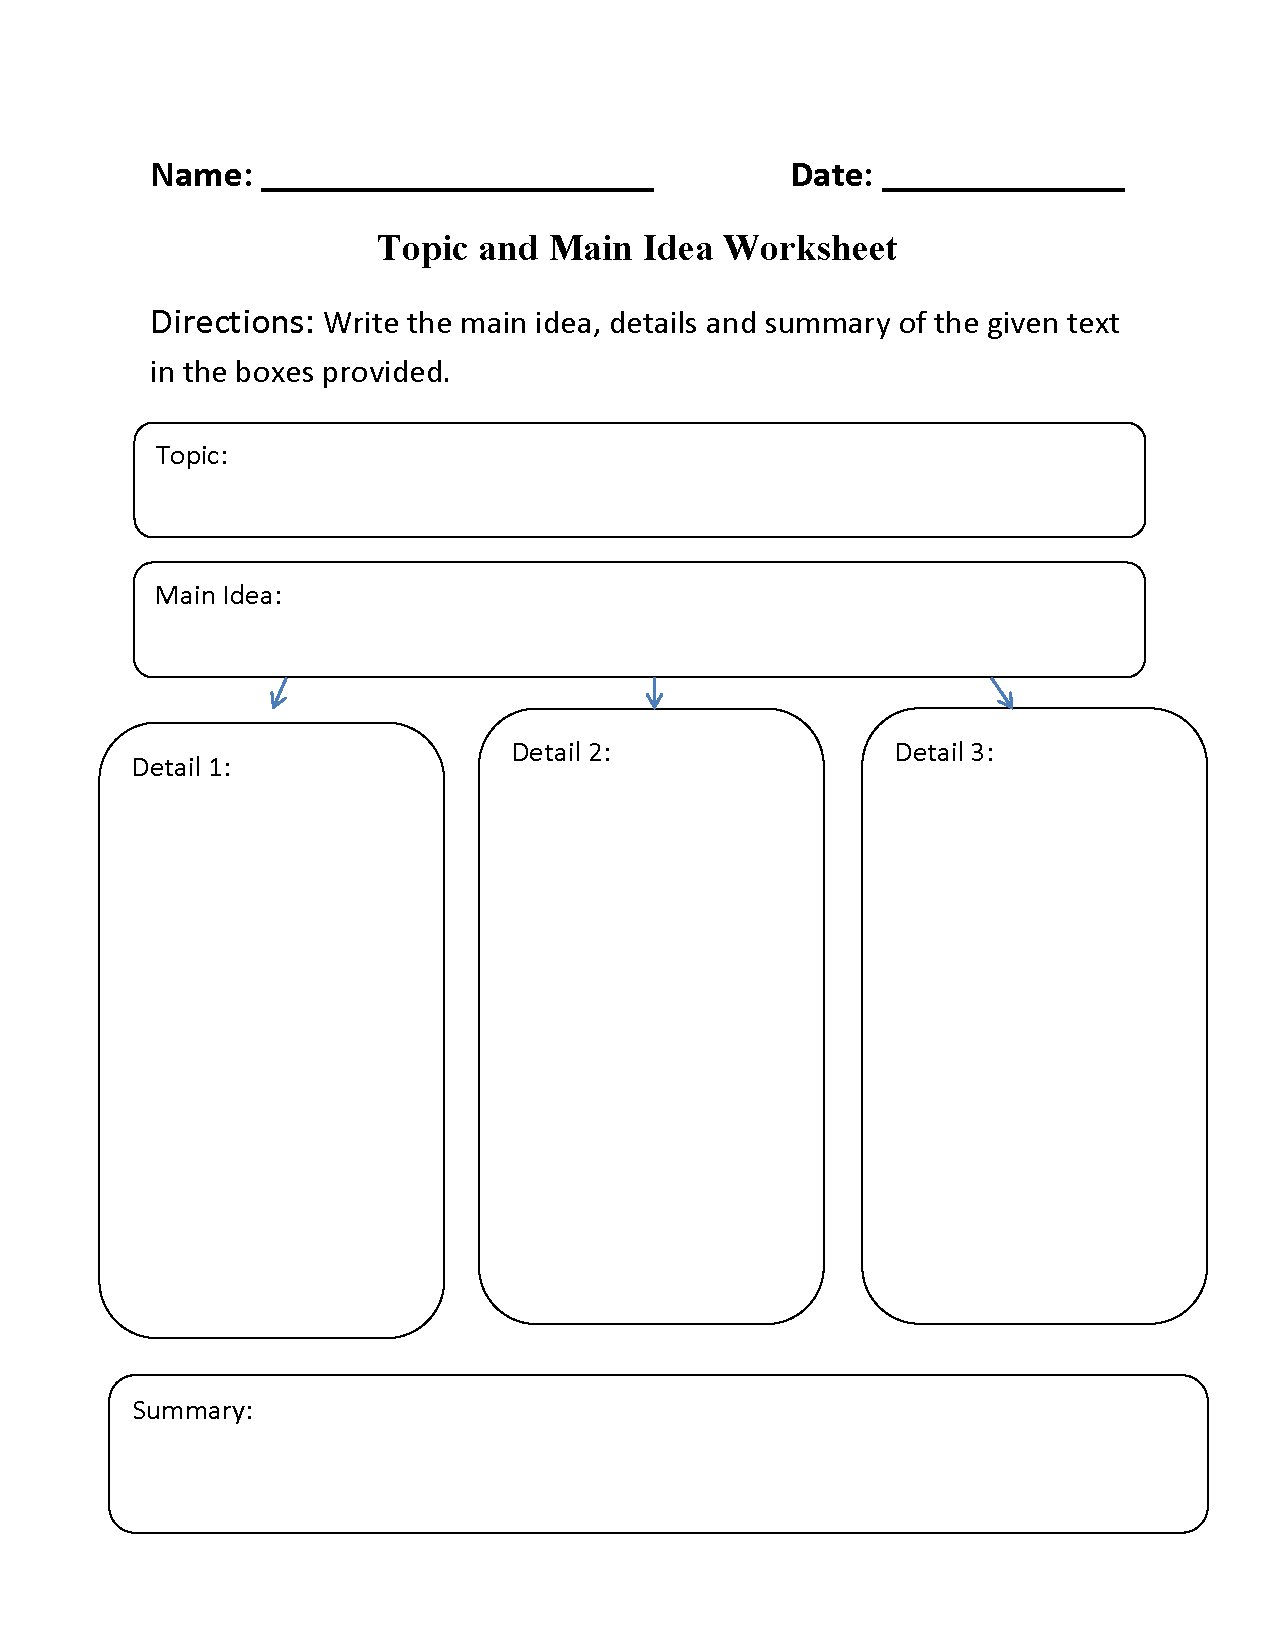 Main Idea Worksheets | Topic and Main Idea Worksheet